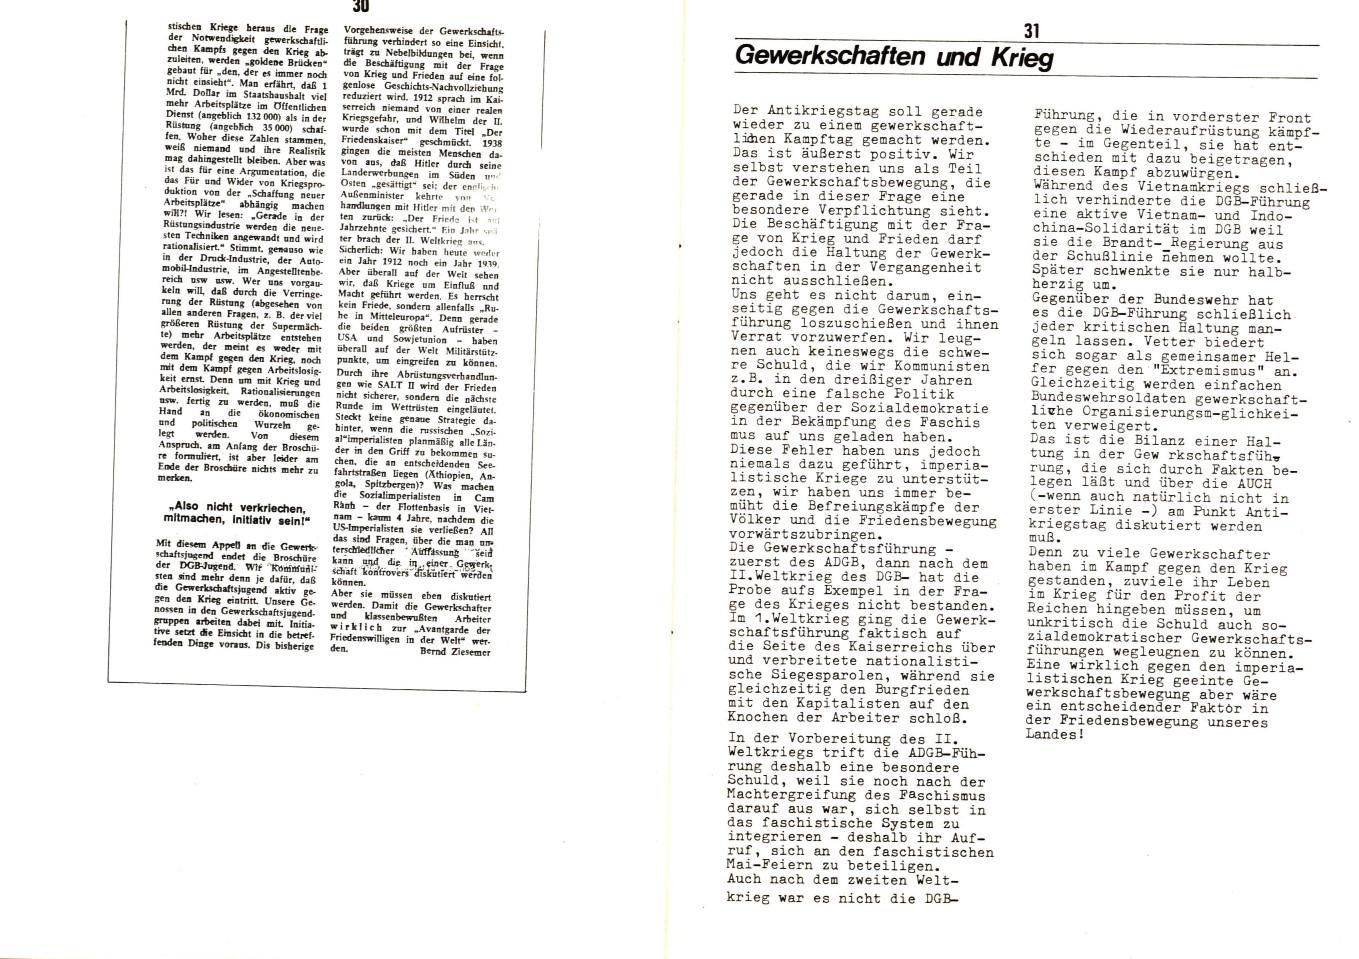 KJVD_1979_Dokumente_zum_Antikriegstag_19